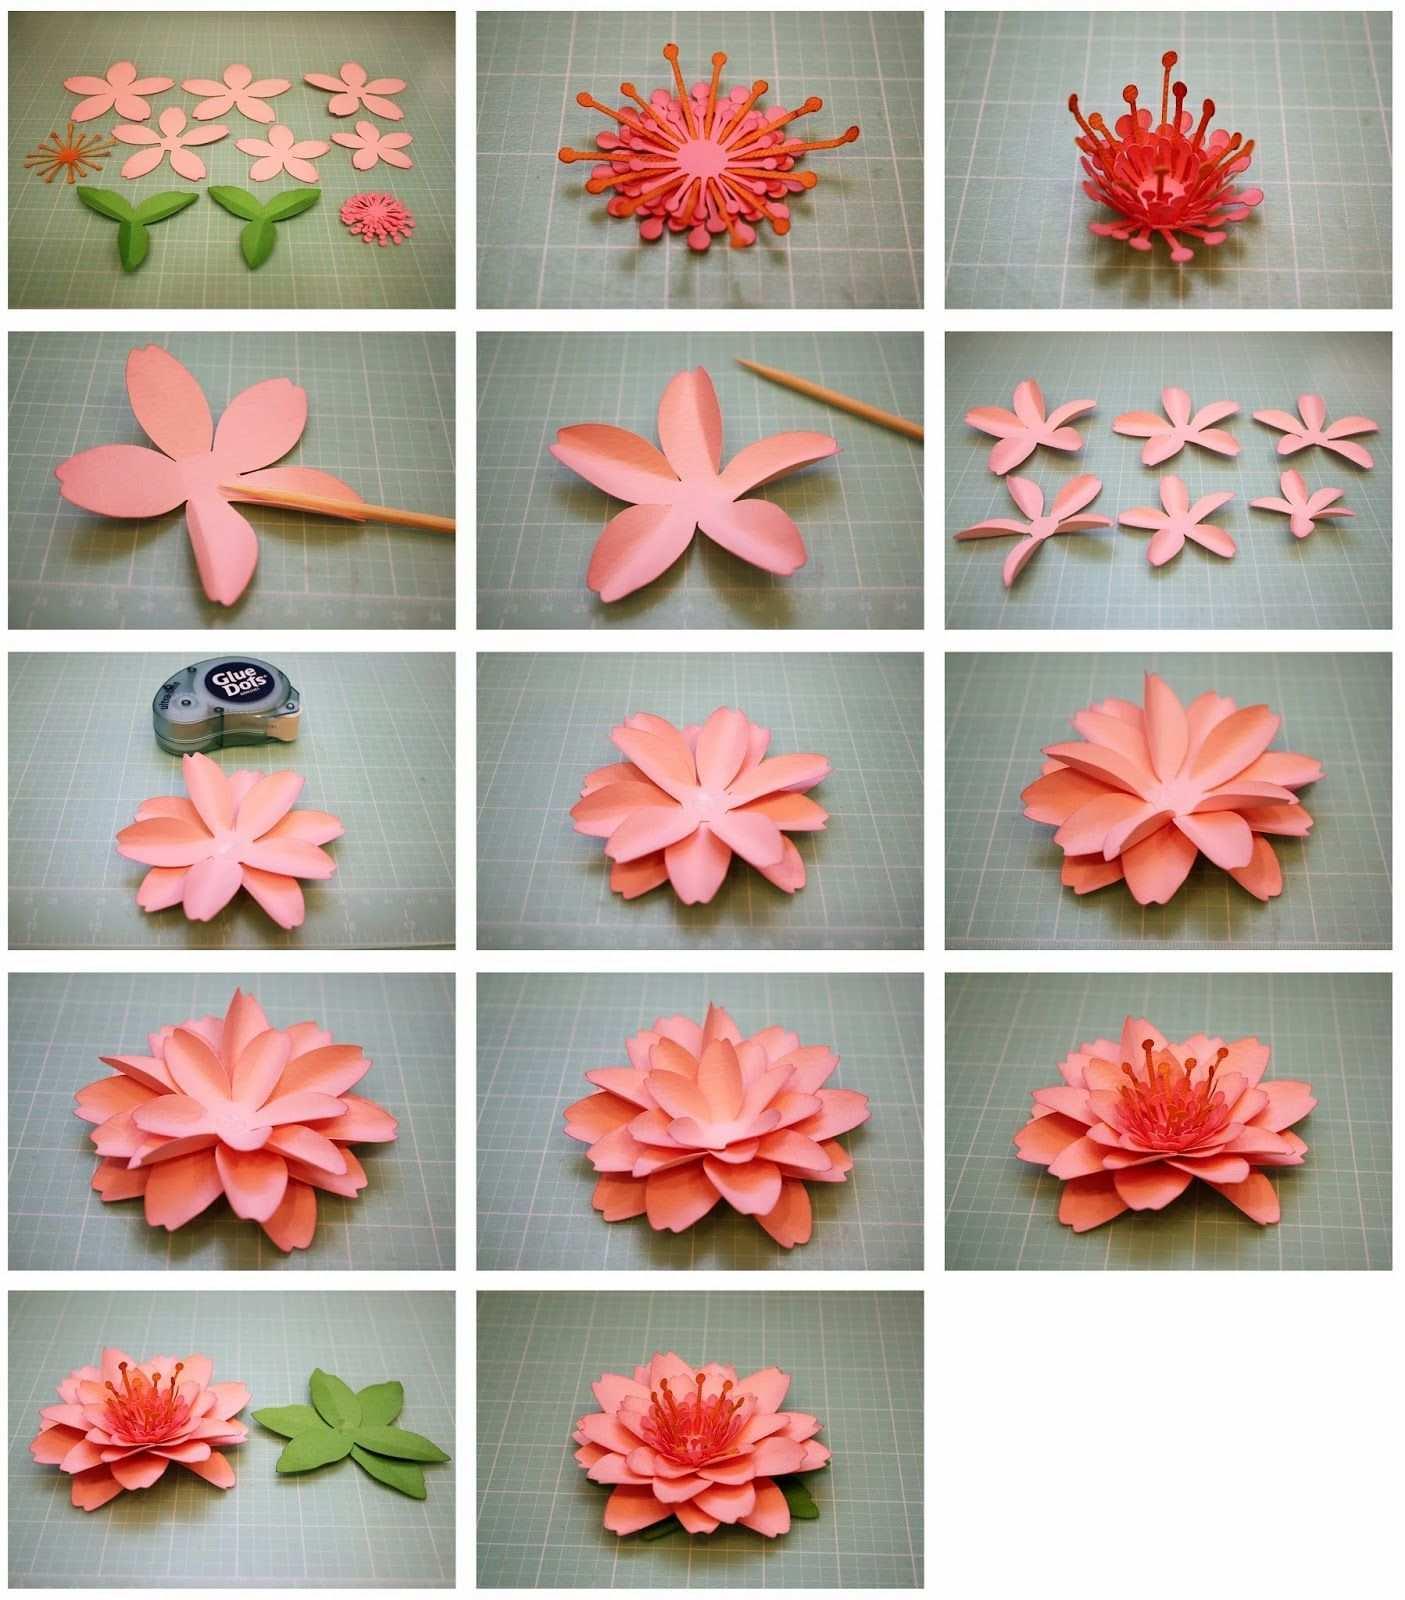 Daffodil And Cherry Blossom 3d Paper Flowers Blumen Basteln Bluten Basteln Origami Blume